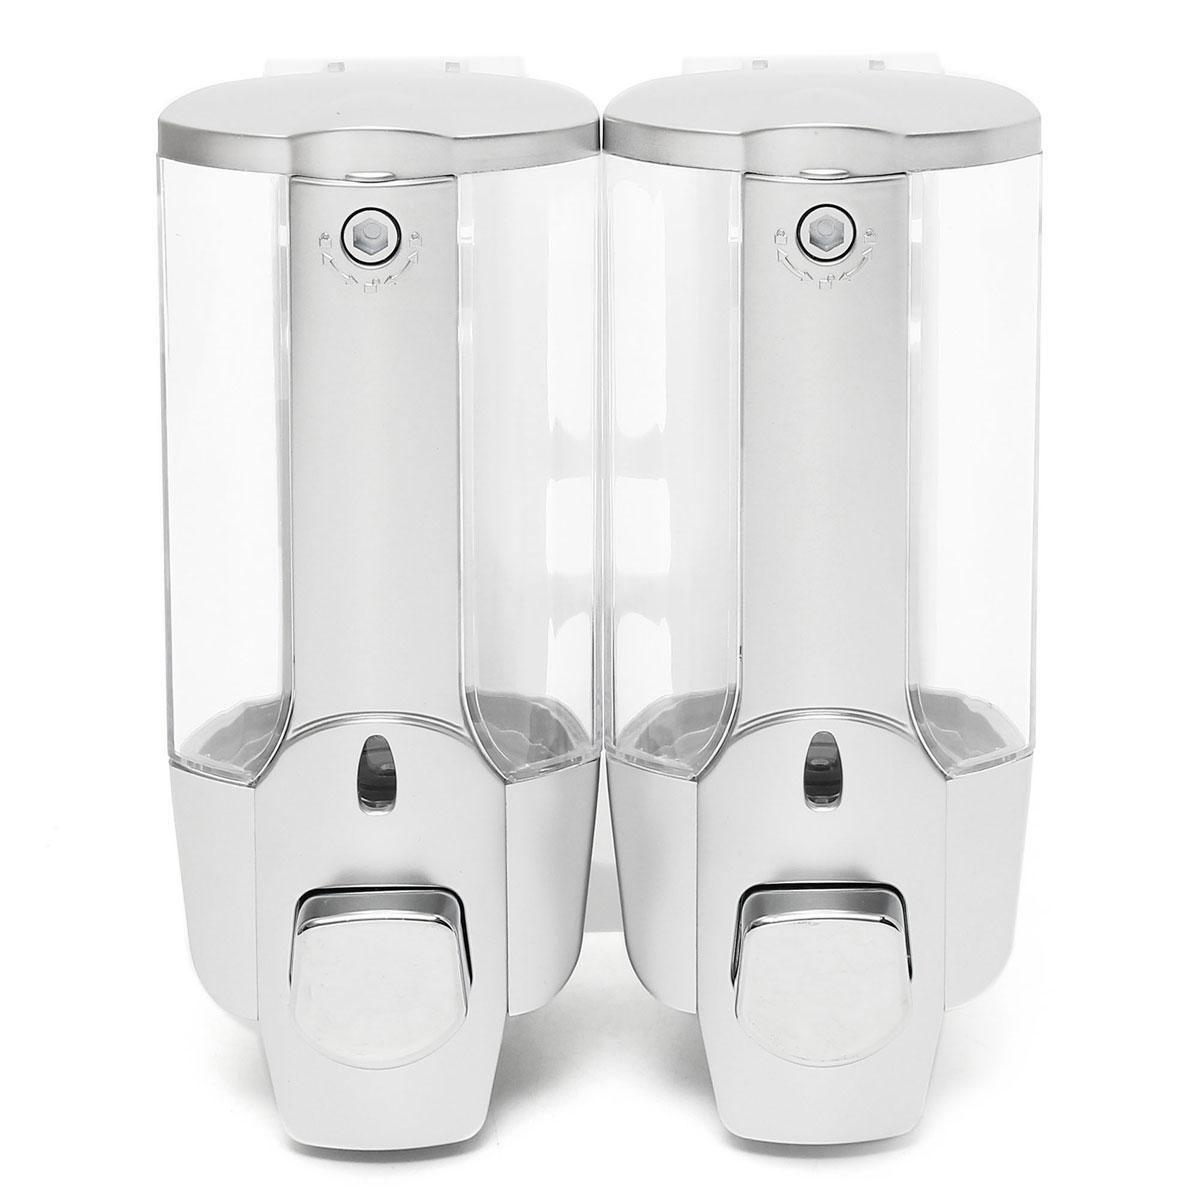 350ml2 Bathroom Double Handle Soap Dispenser Wall Mounted Liquid Soap Dispenser Home Shampoo